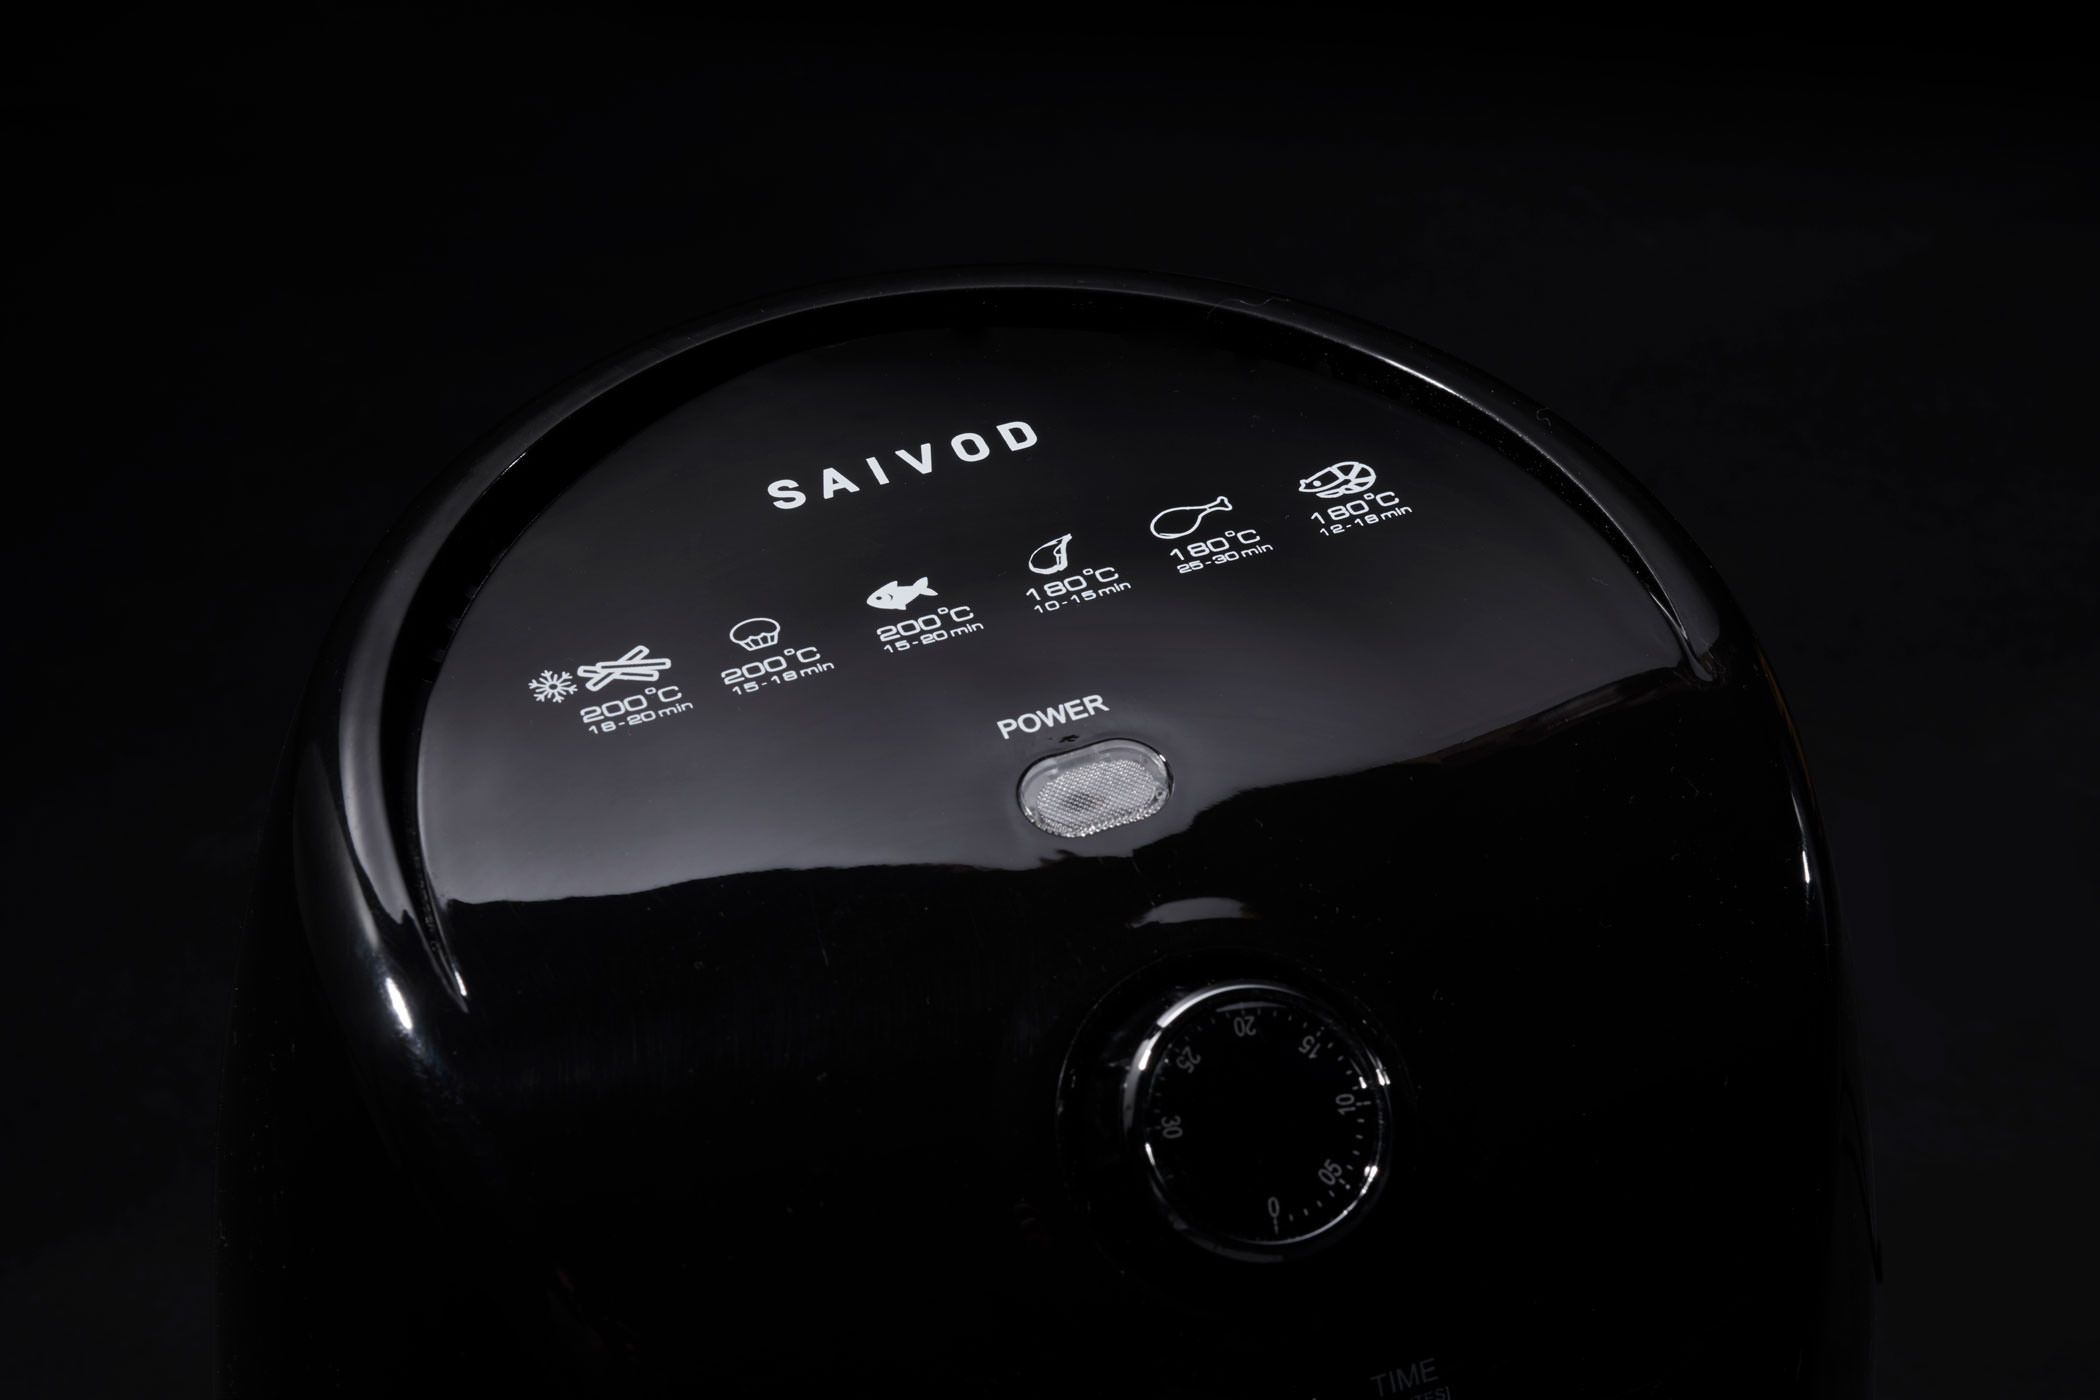 Saivod3